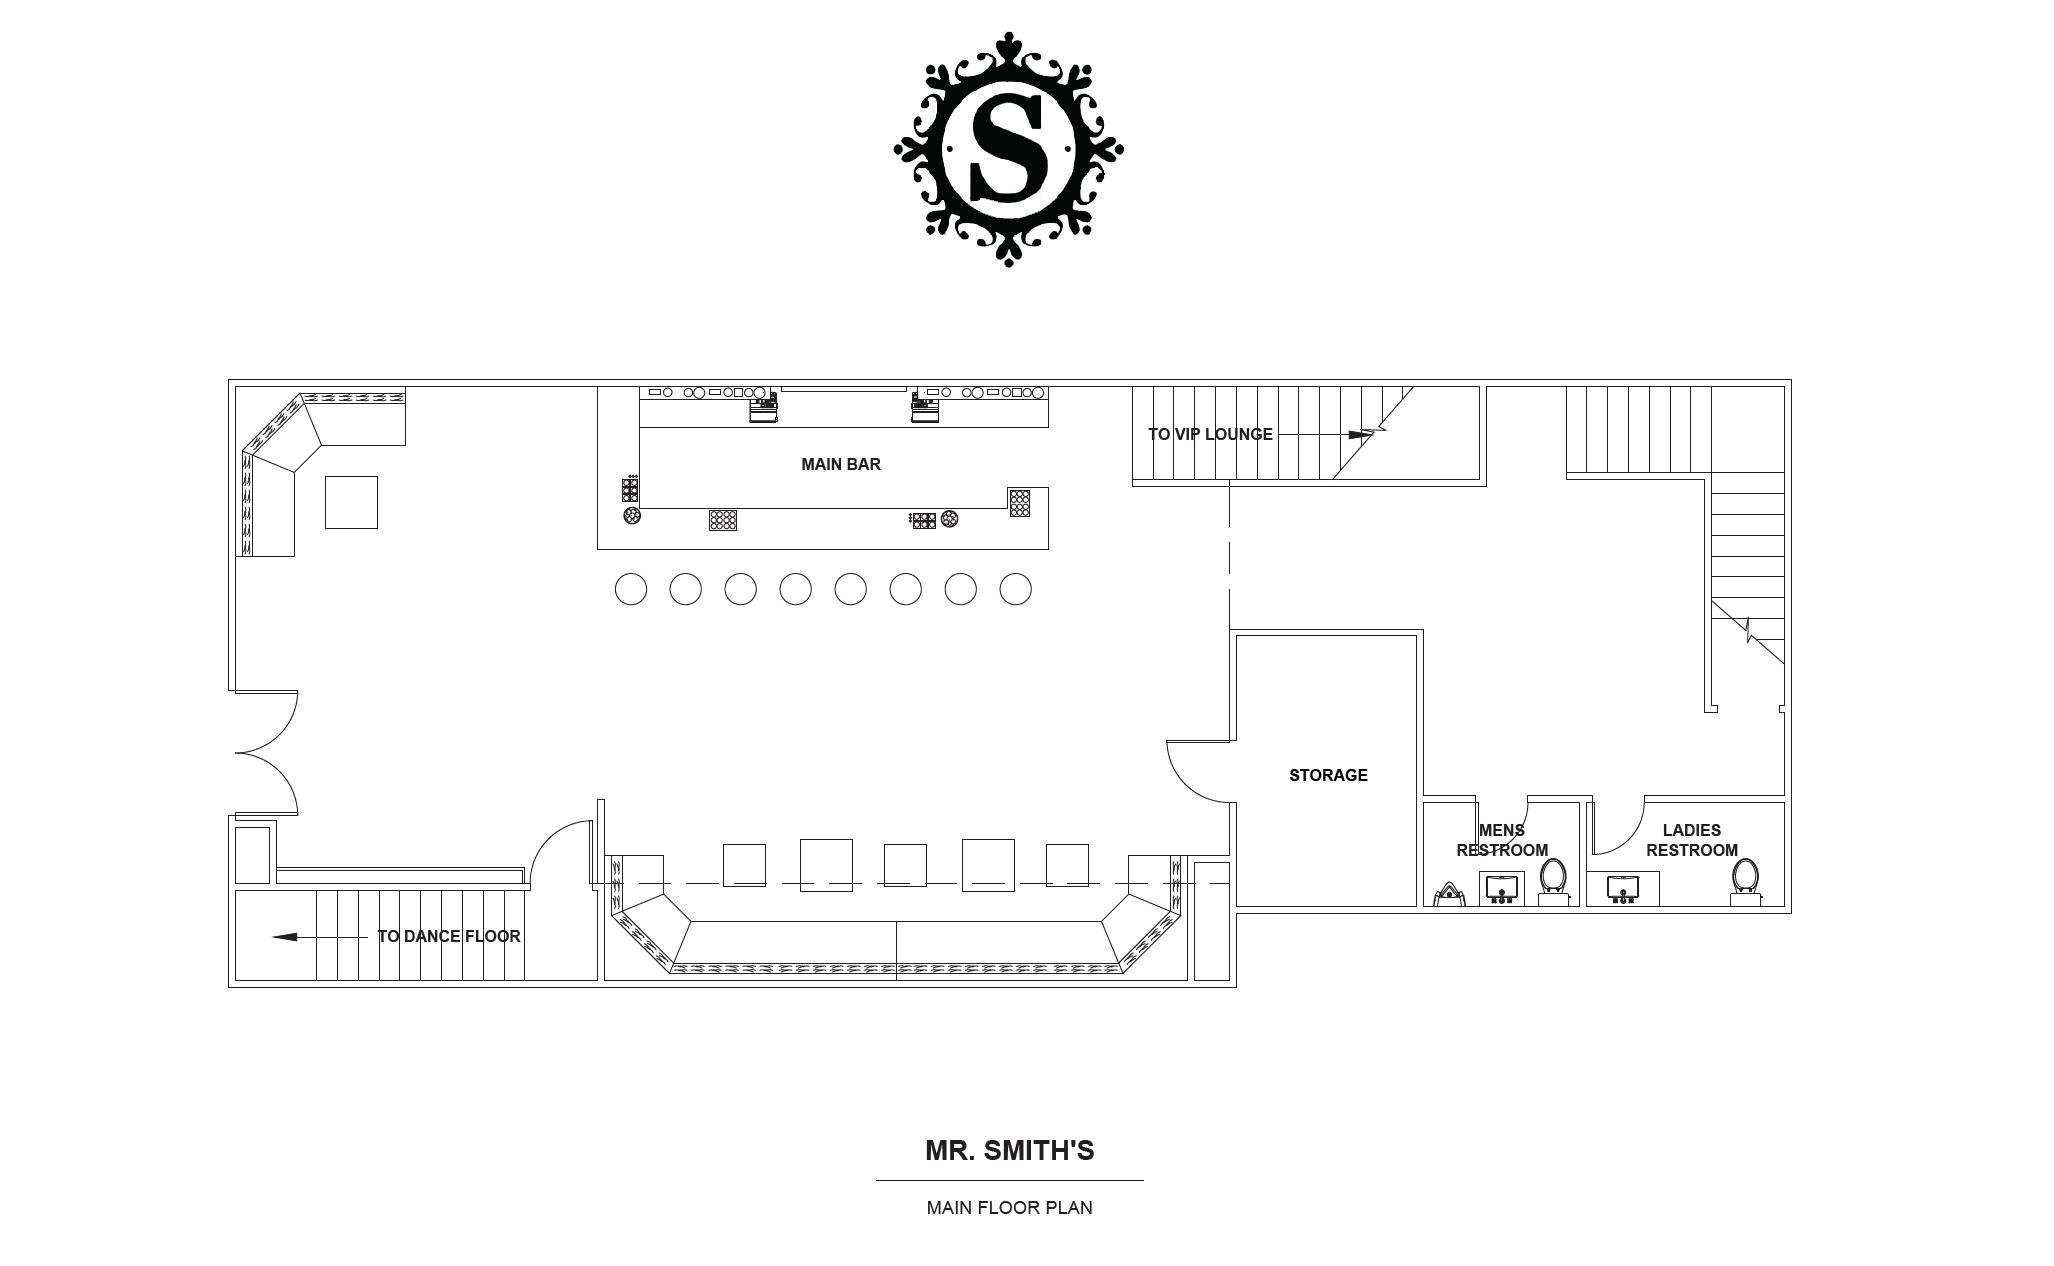 Mr. Smith's Main Floor plan .png